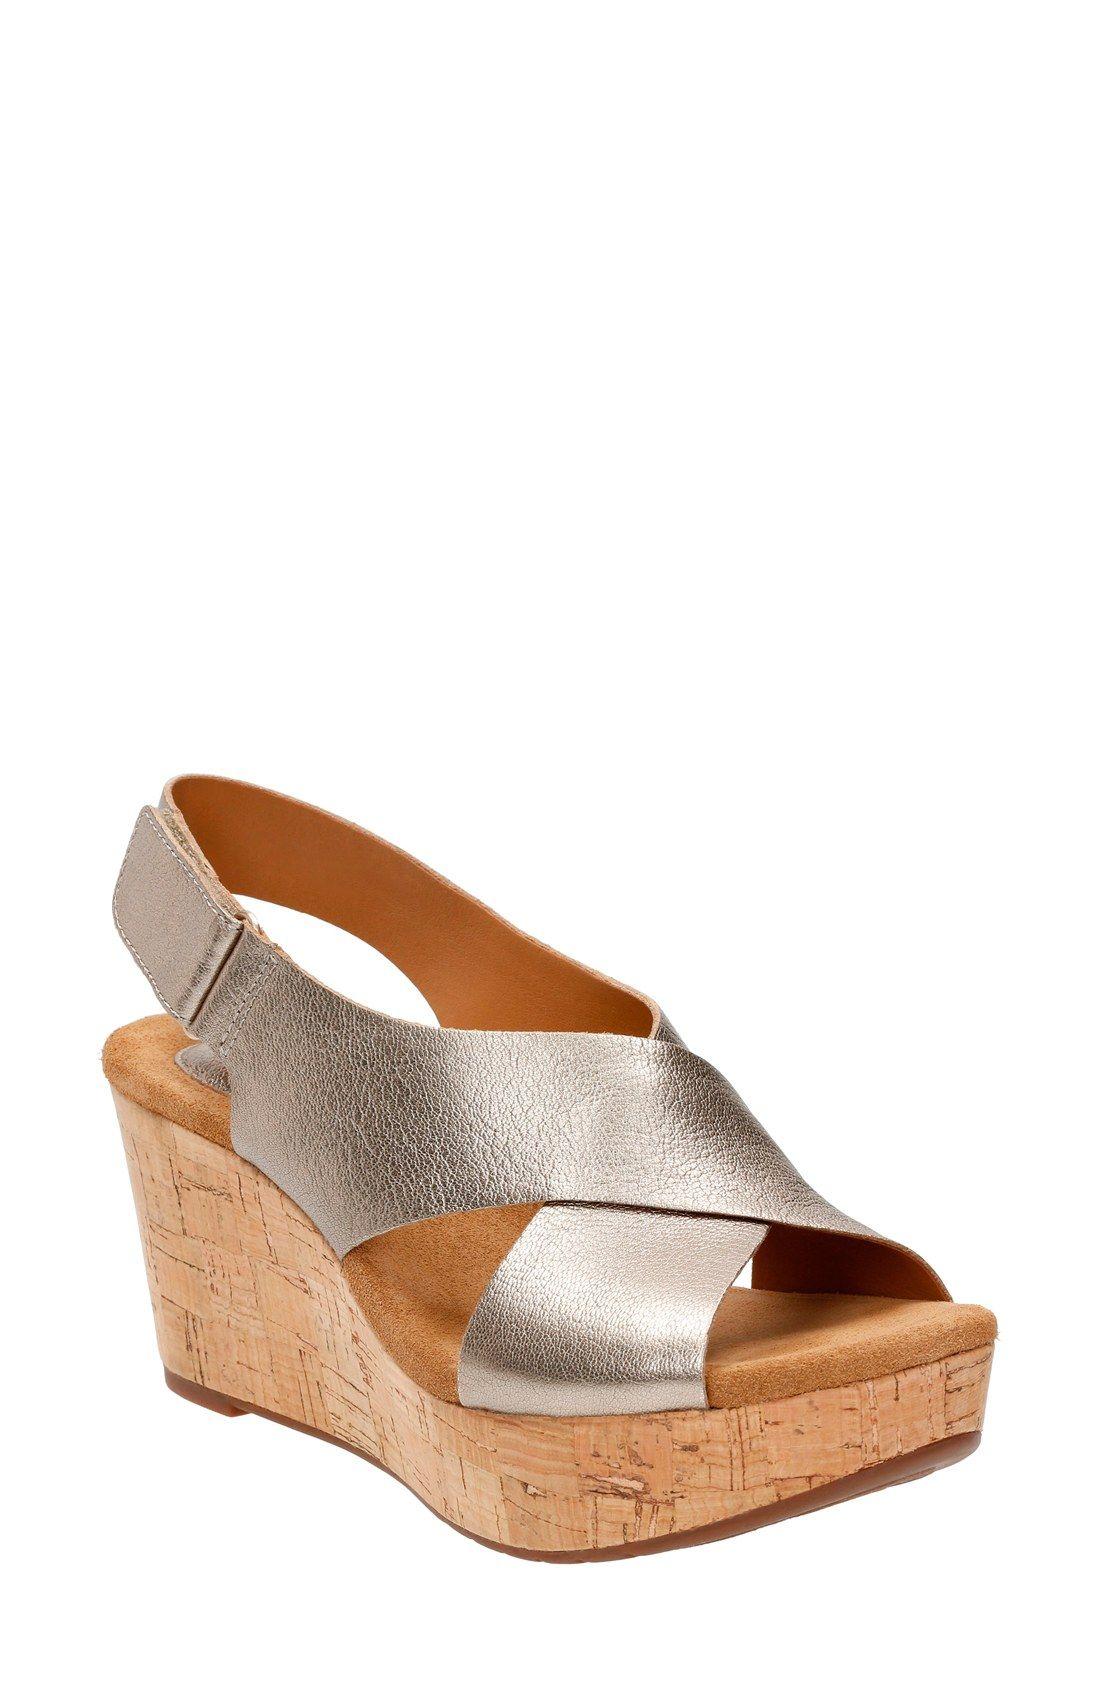 Clarks® 'Caslynn Shae' Wedge Sandal